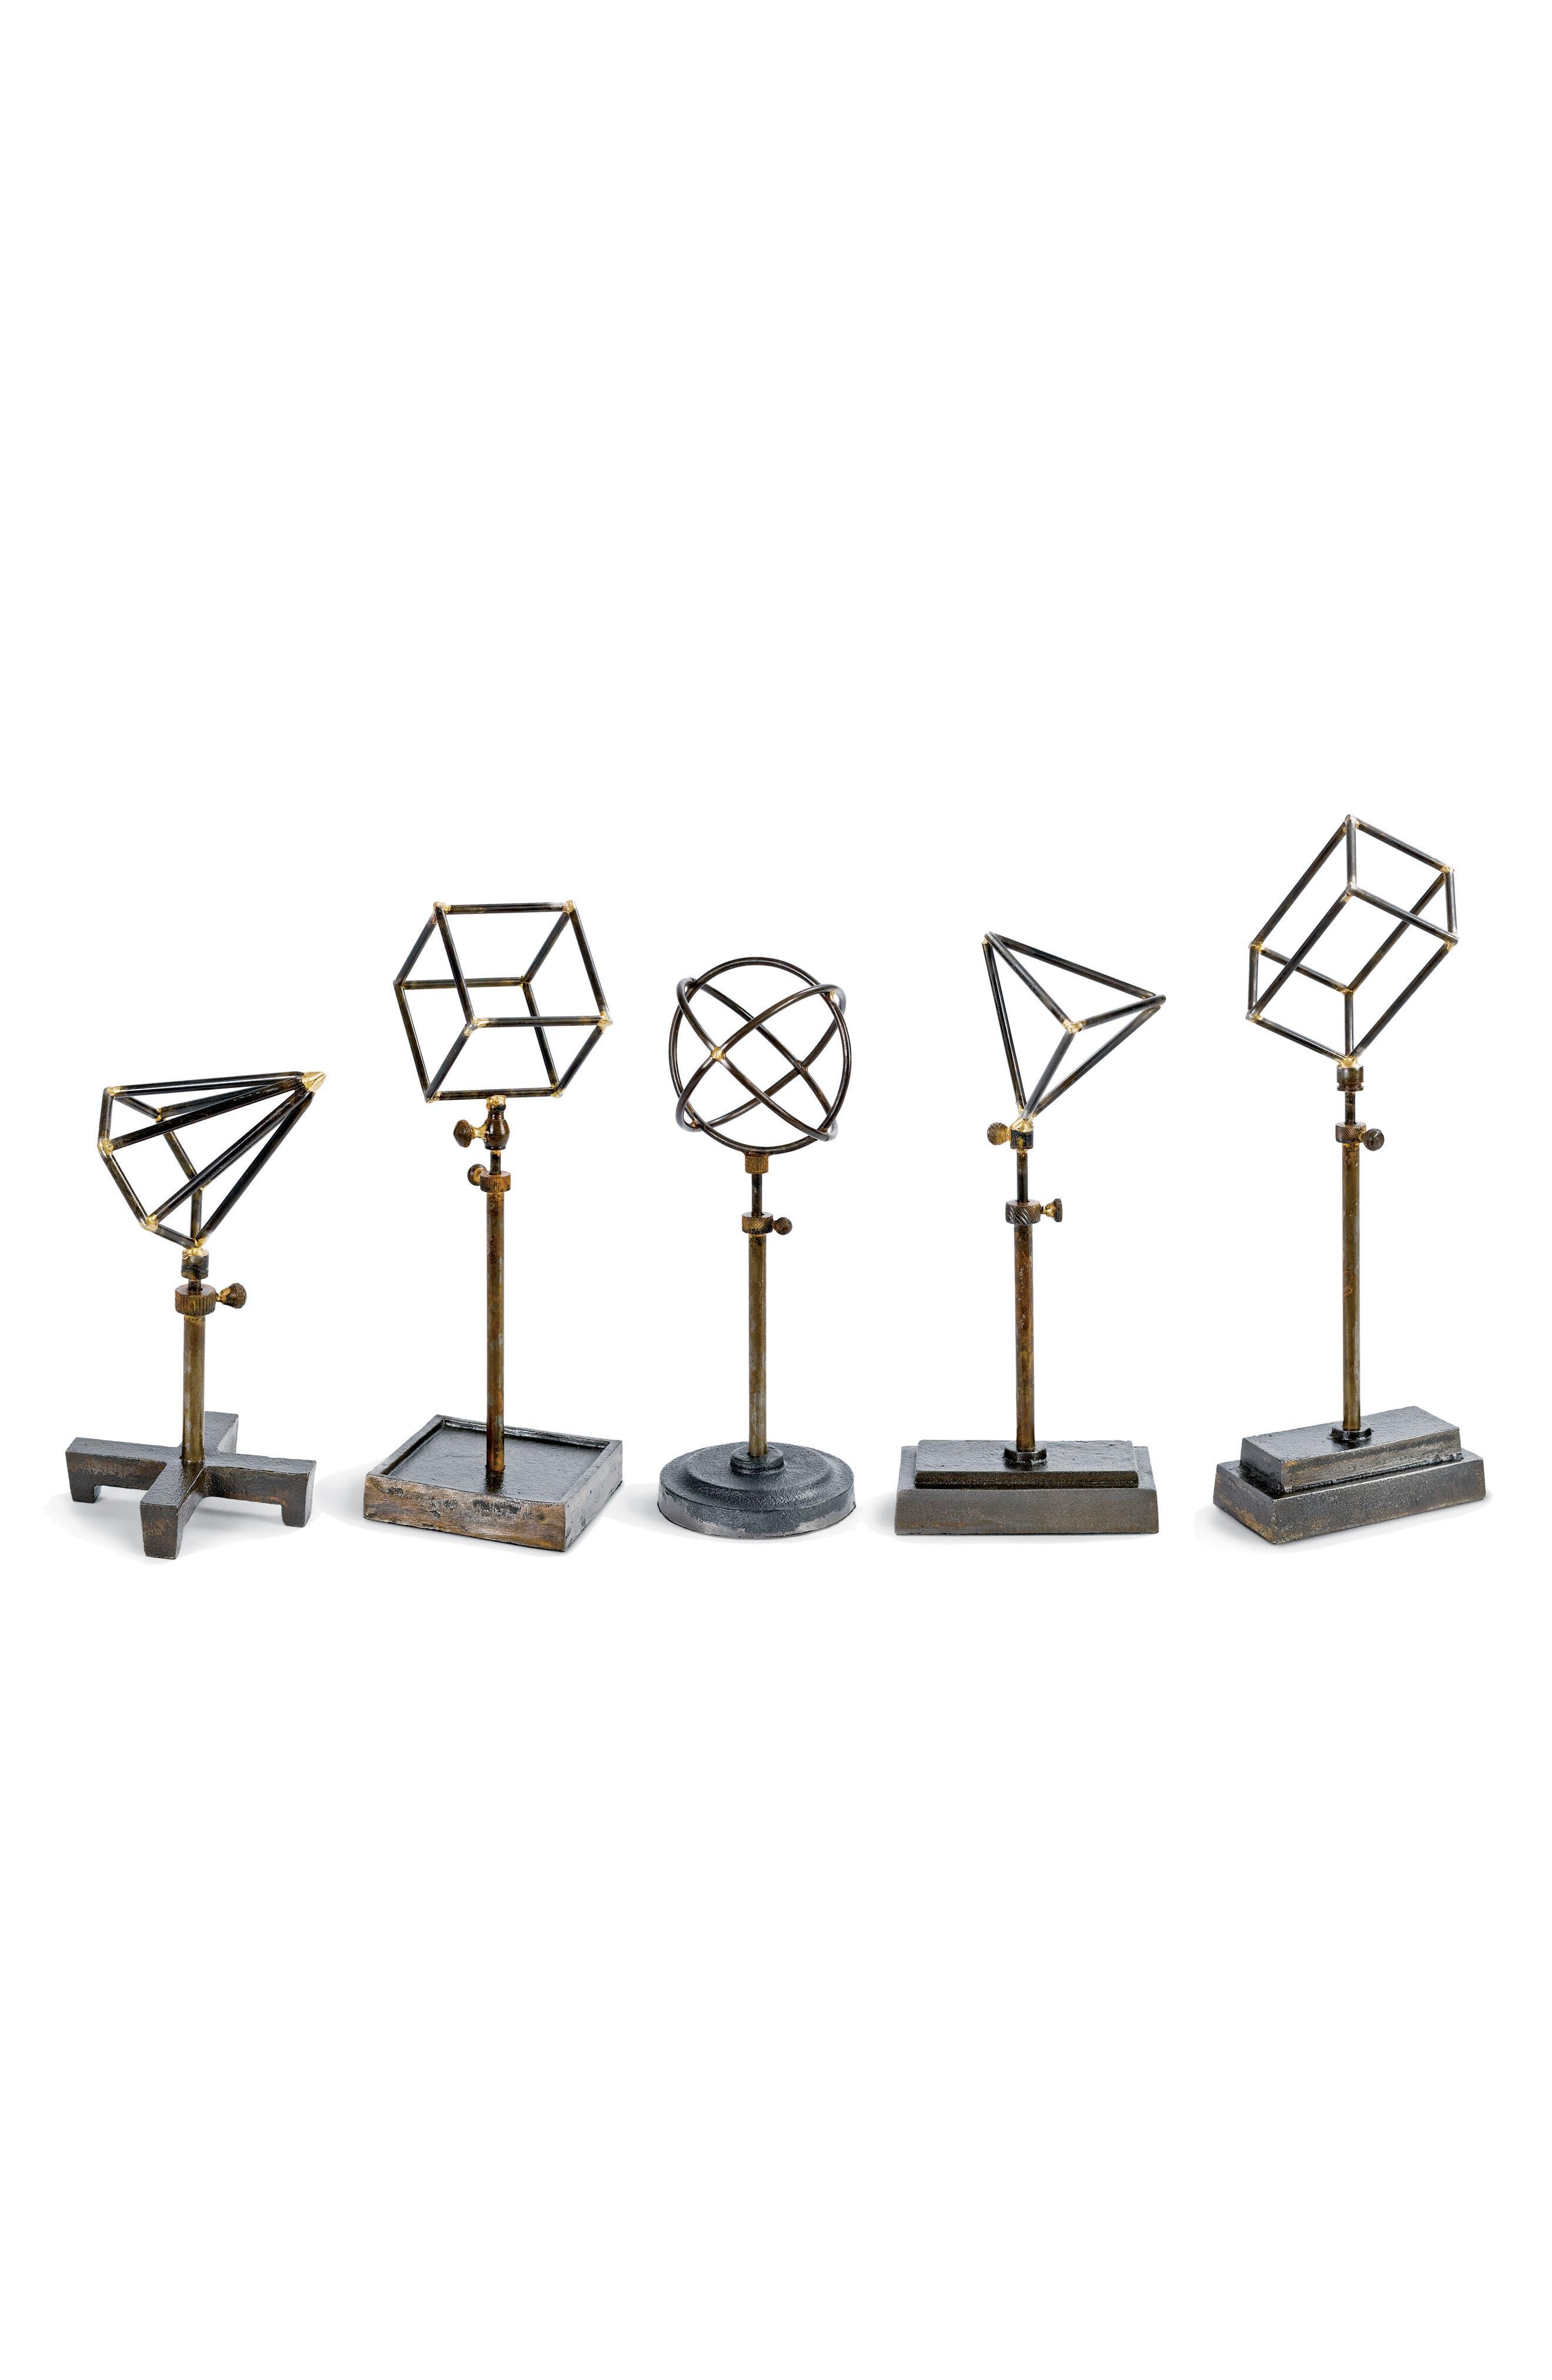 Set of 5 Geometric Sculptures,                             Main thumbnail 1, color,                             BRASS